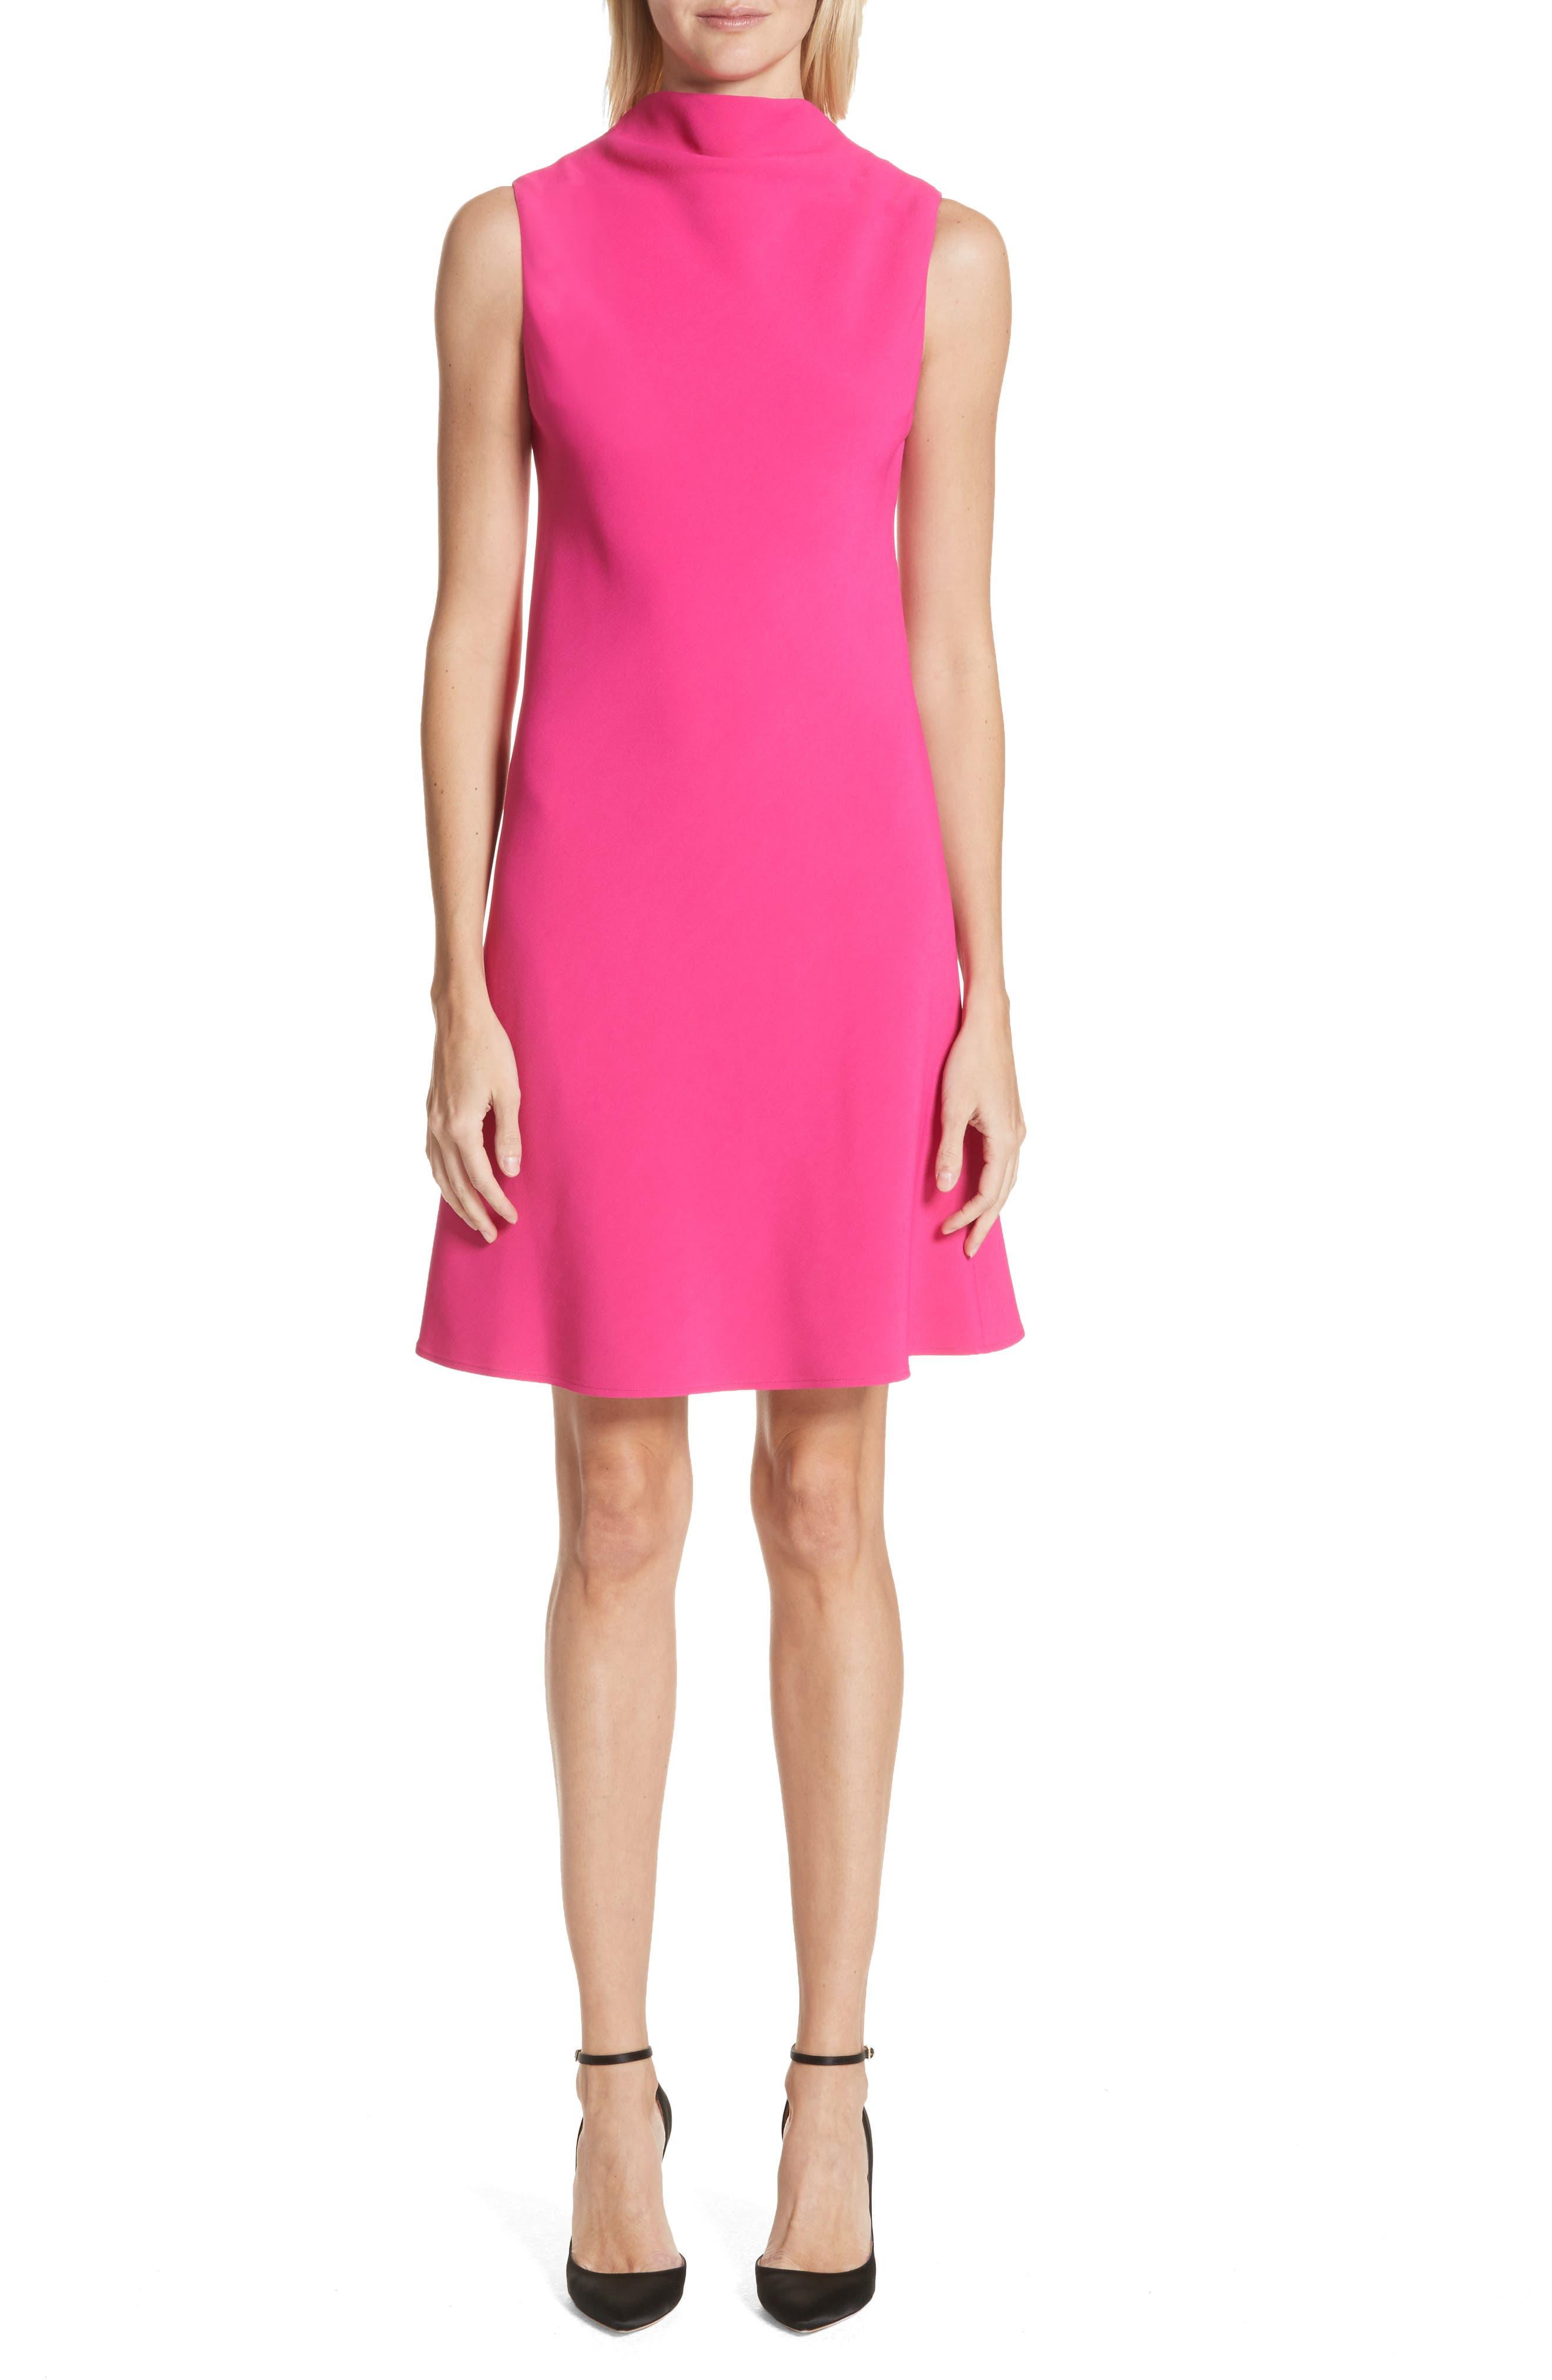 Alternate Image 1 Selected - Brandon Maxwell Drape Front Dress